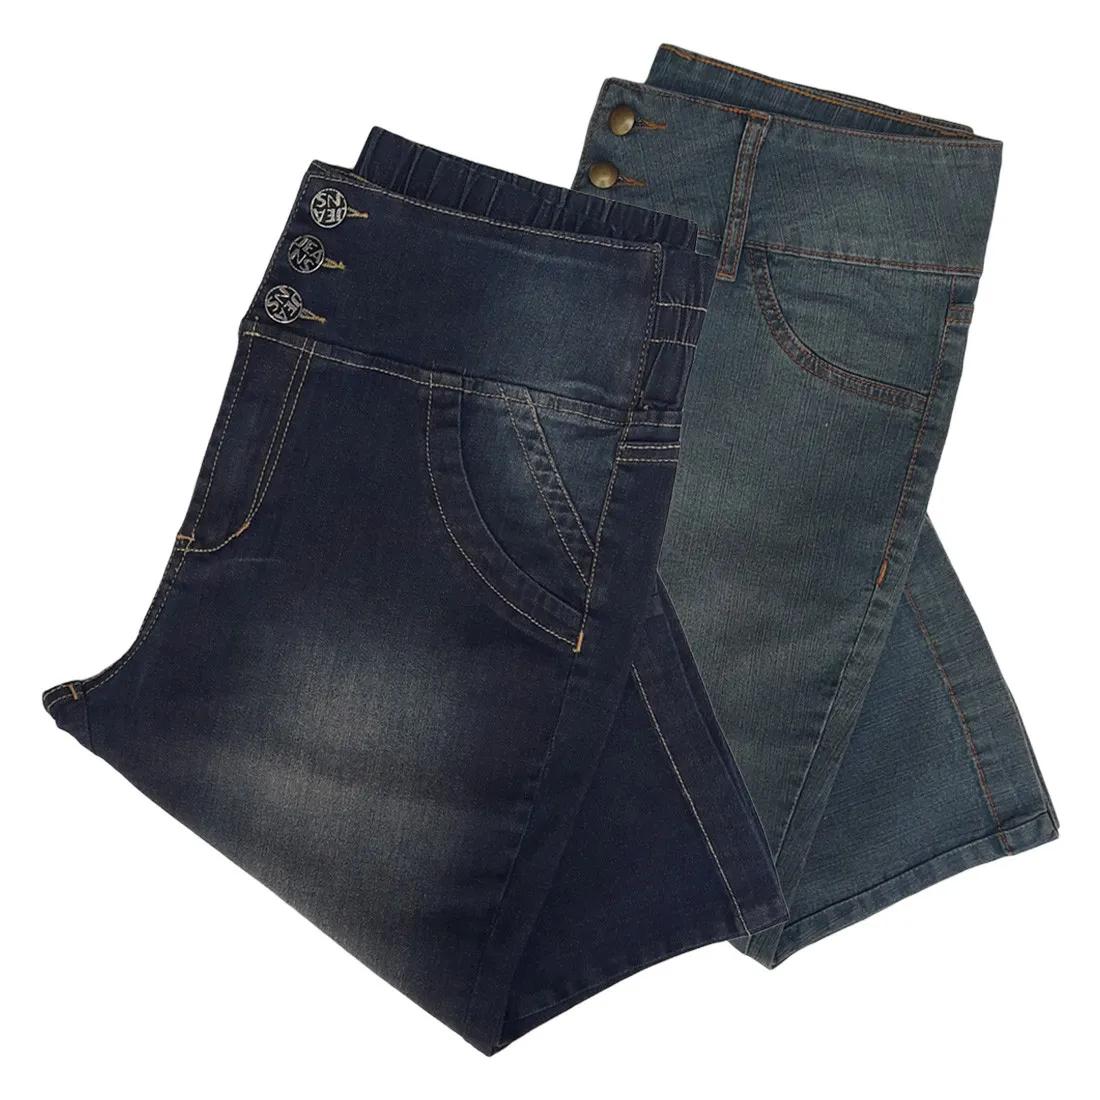 Kit c/ 2 Bermudas Jeans Fem Capri Plus Size Cint.Alta Tam 44